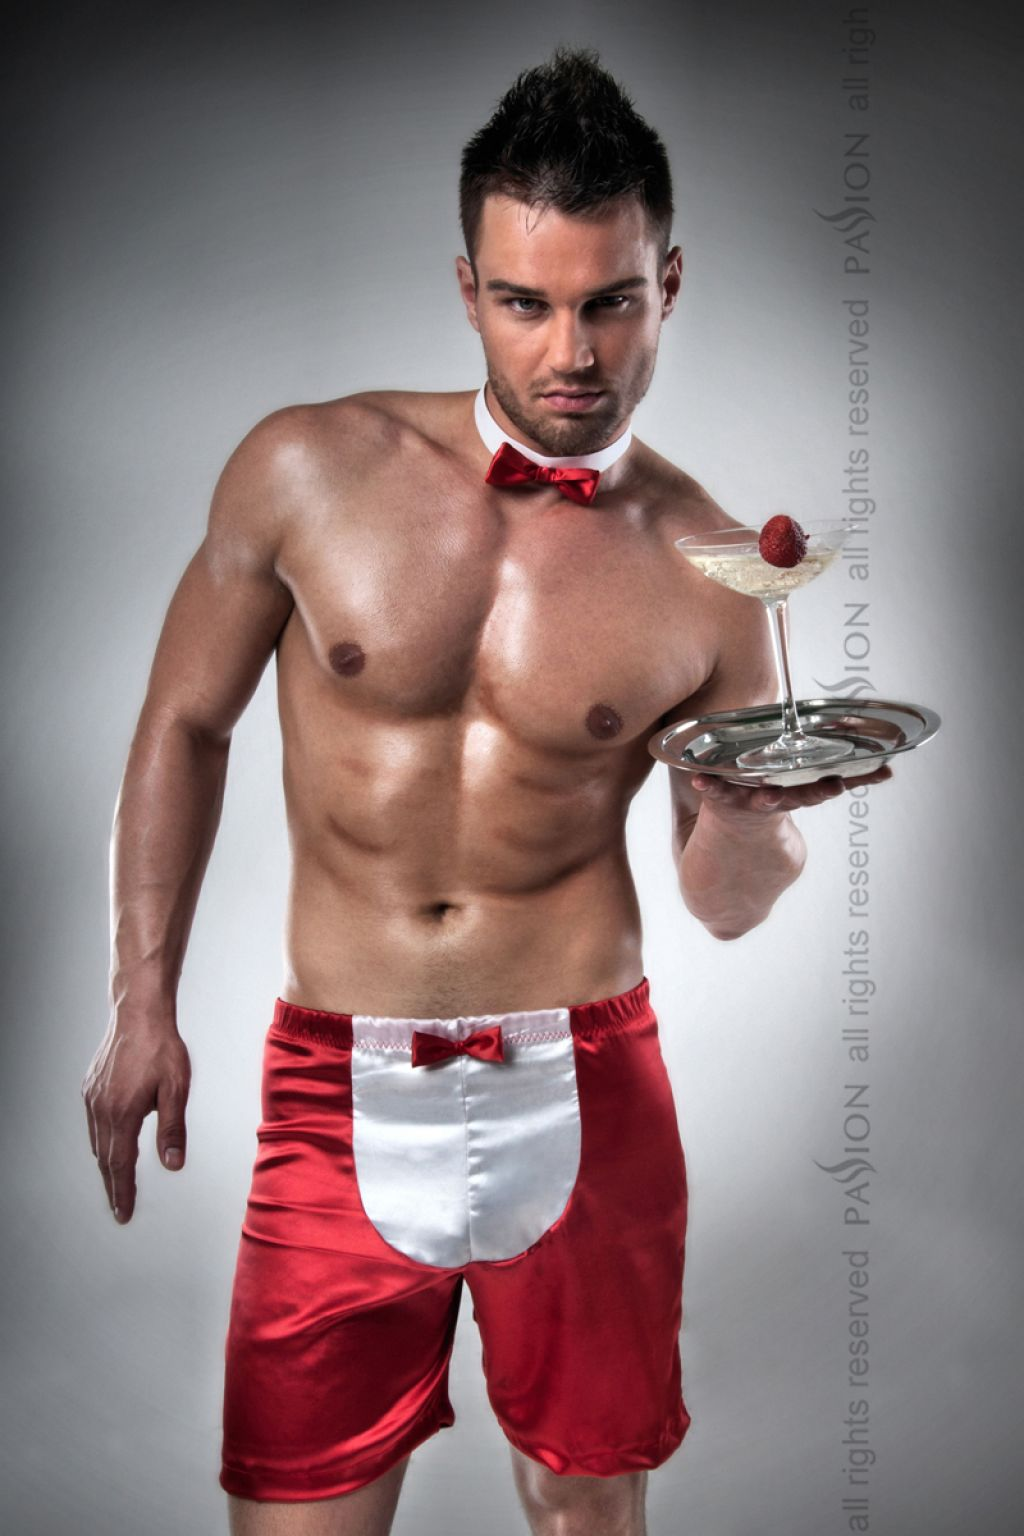 Disfraz masculino sexy de camarero